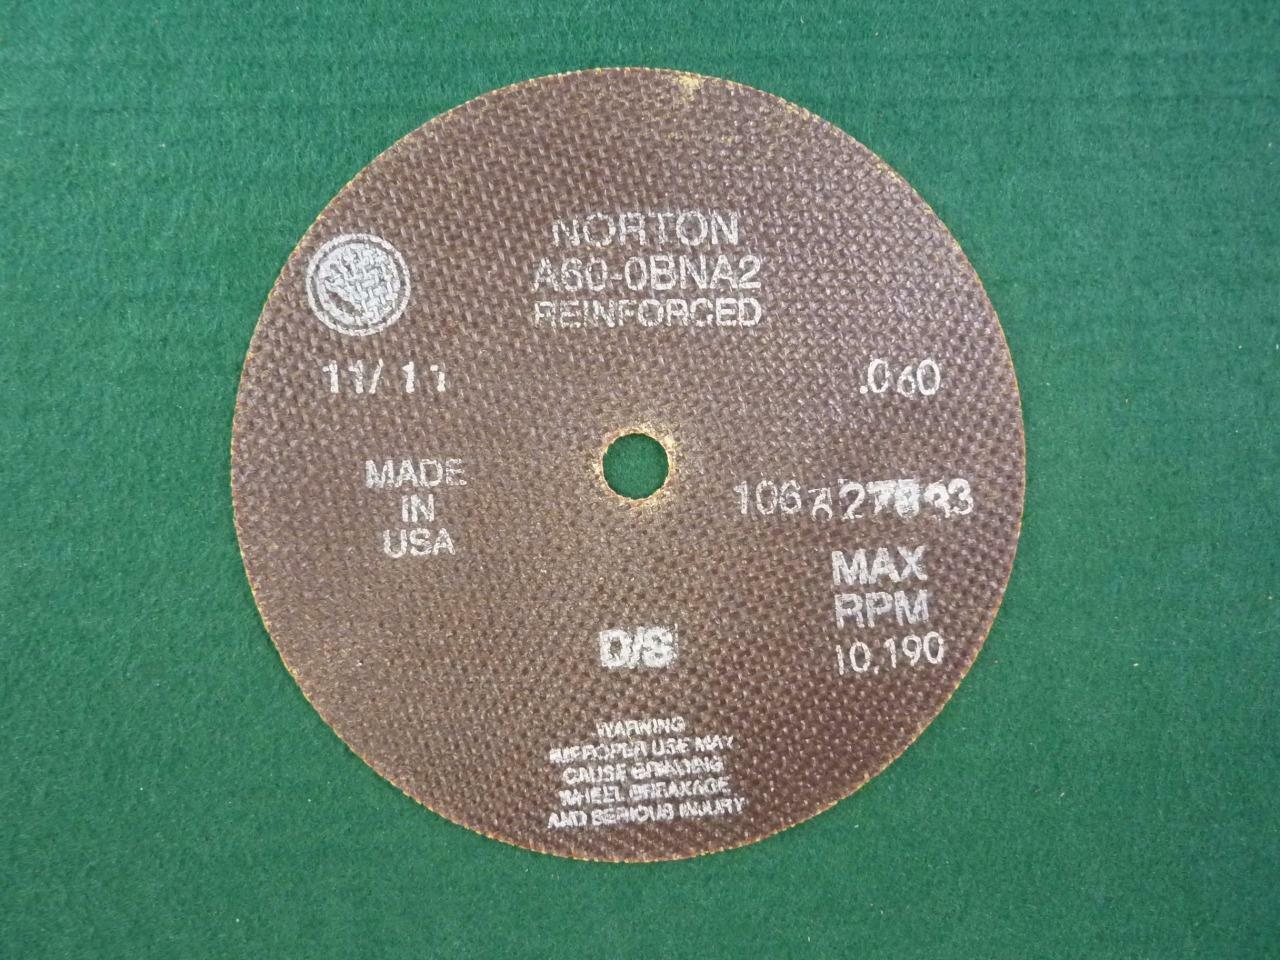 "NORTON 6/"" x 0.060 x 1//2/"" Reinforced 60 Grit A60-0BNA2 Cut Off Wheel **Lot of 4**"